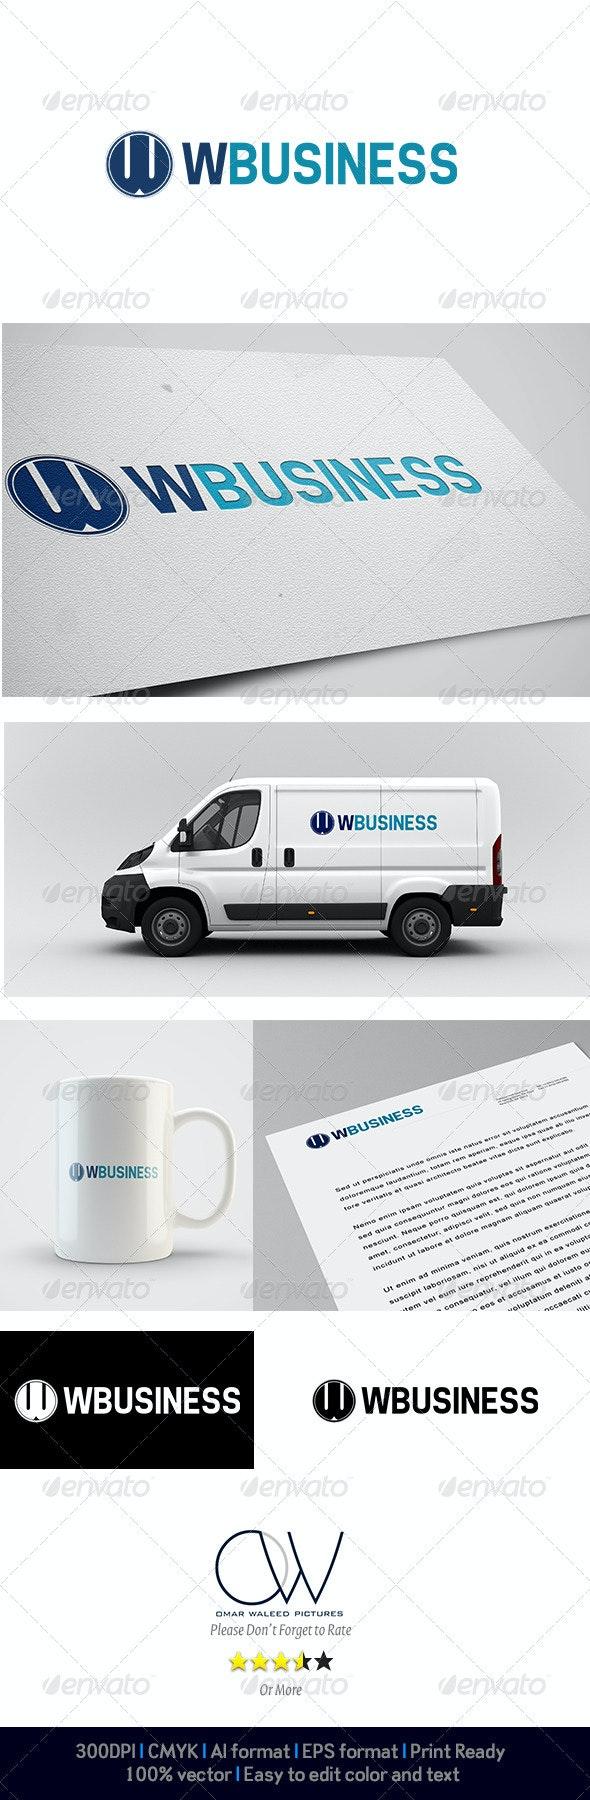 W business Logo - Letters Logo Templates